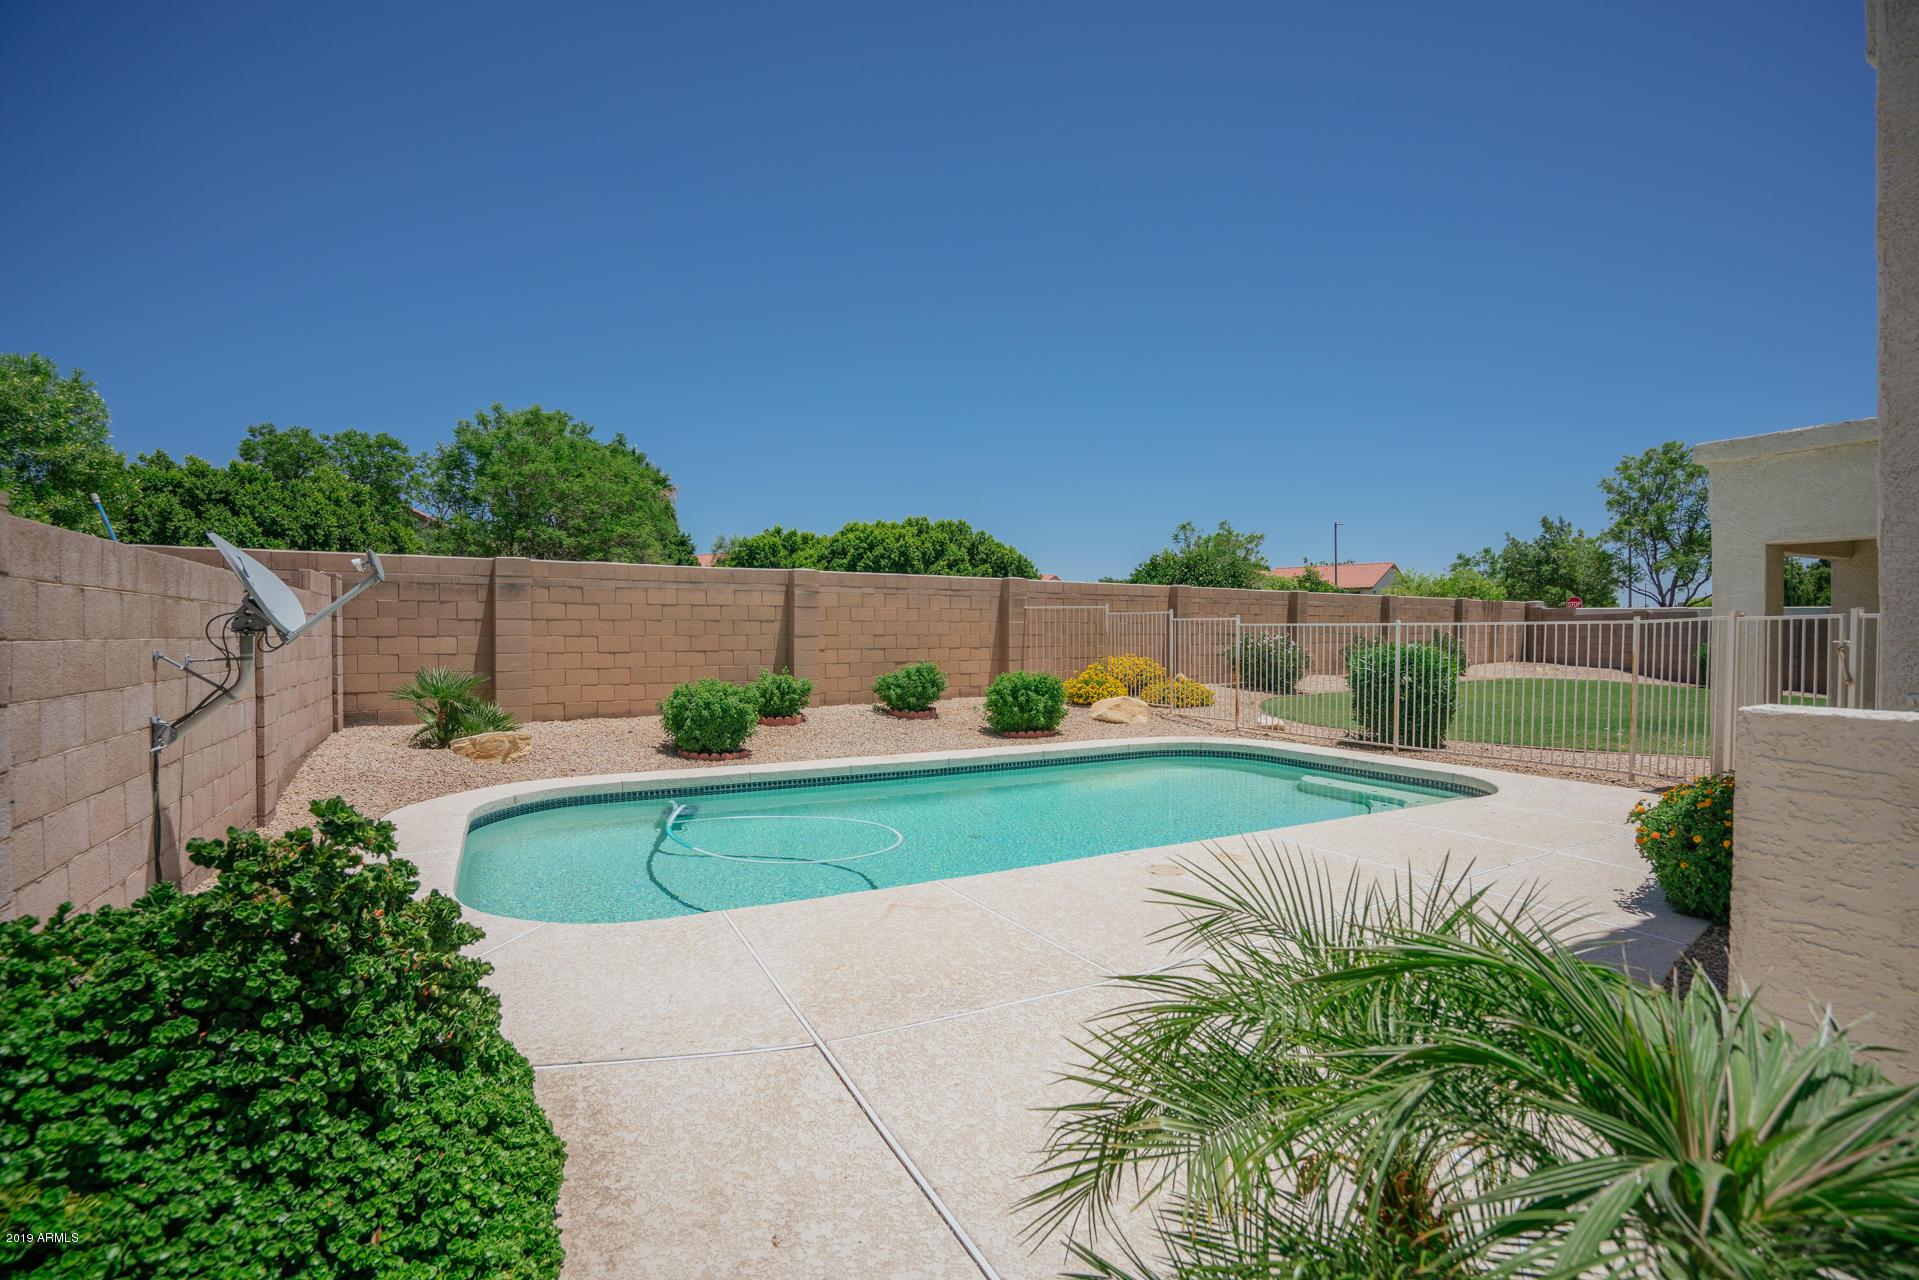 MLS 5948296 12689 N 57TH Drive, Glendale, AZ 85304 Glendale AZ North Glendale